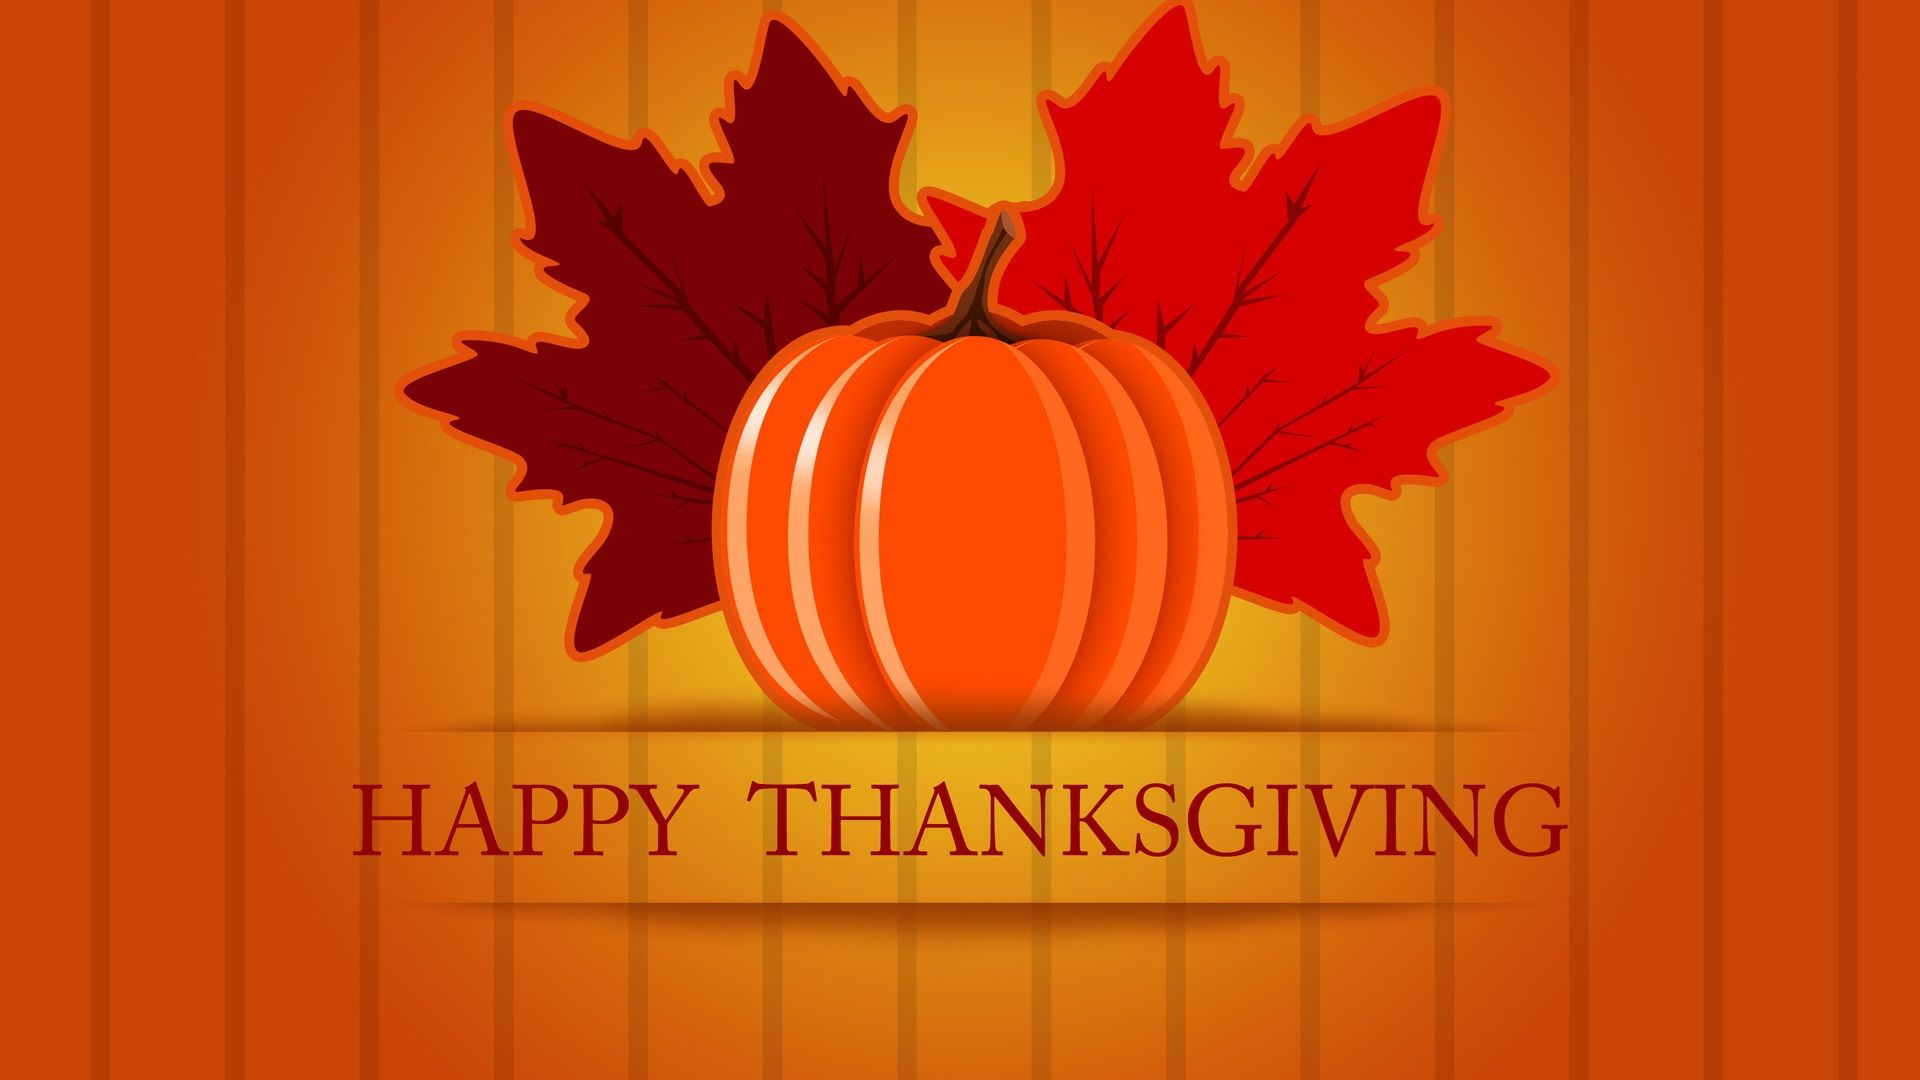 Thanksgiving Background 19136 Happy Thanksgiving Wallpaper